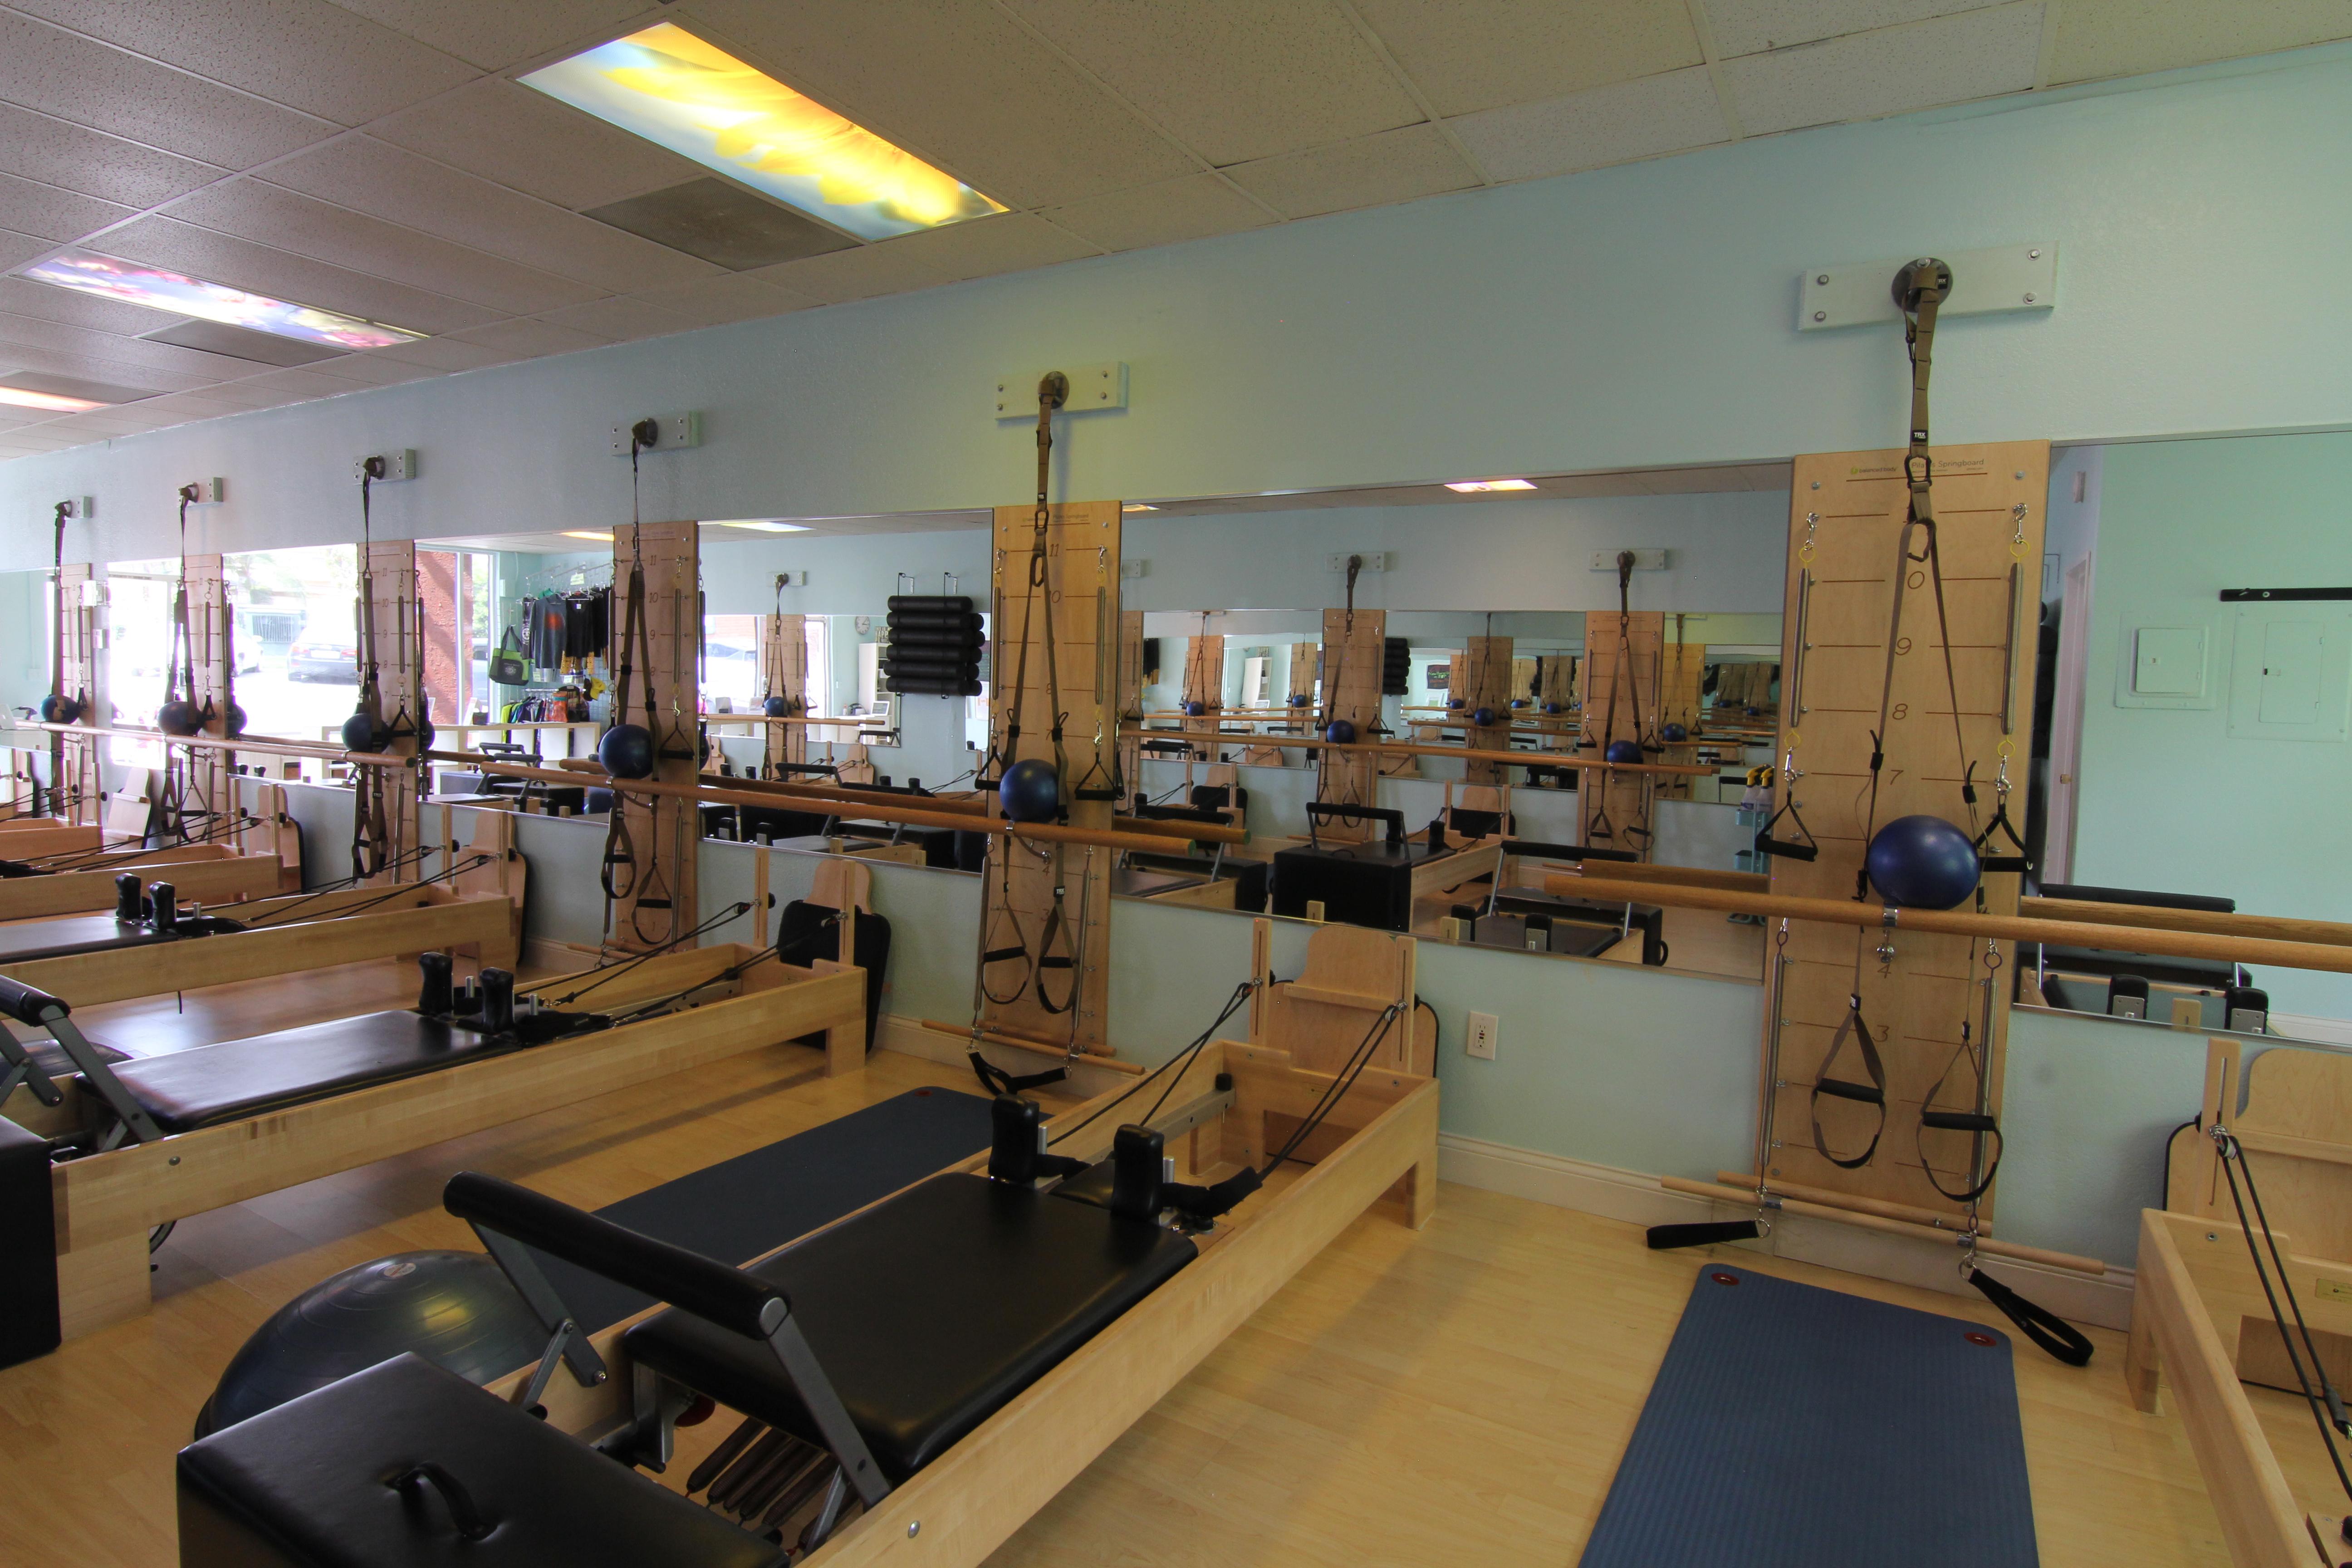 Club Pilates 6690 Mission Gorge Road San Diego, CA Pilates - MapQuest